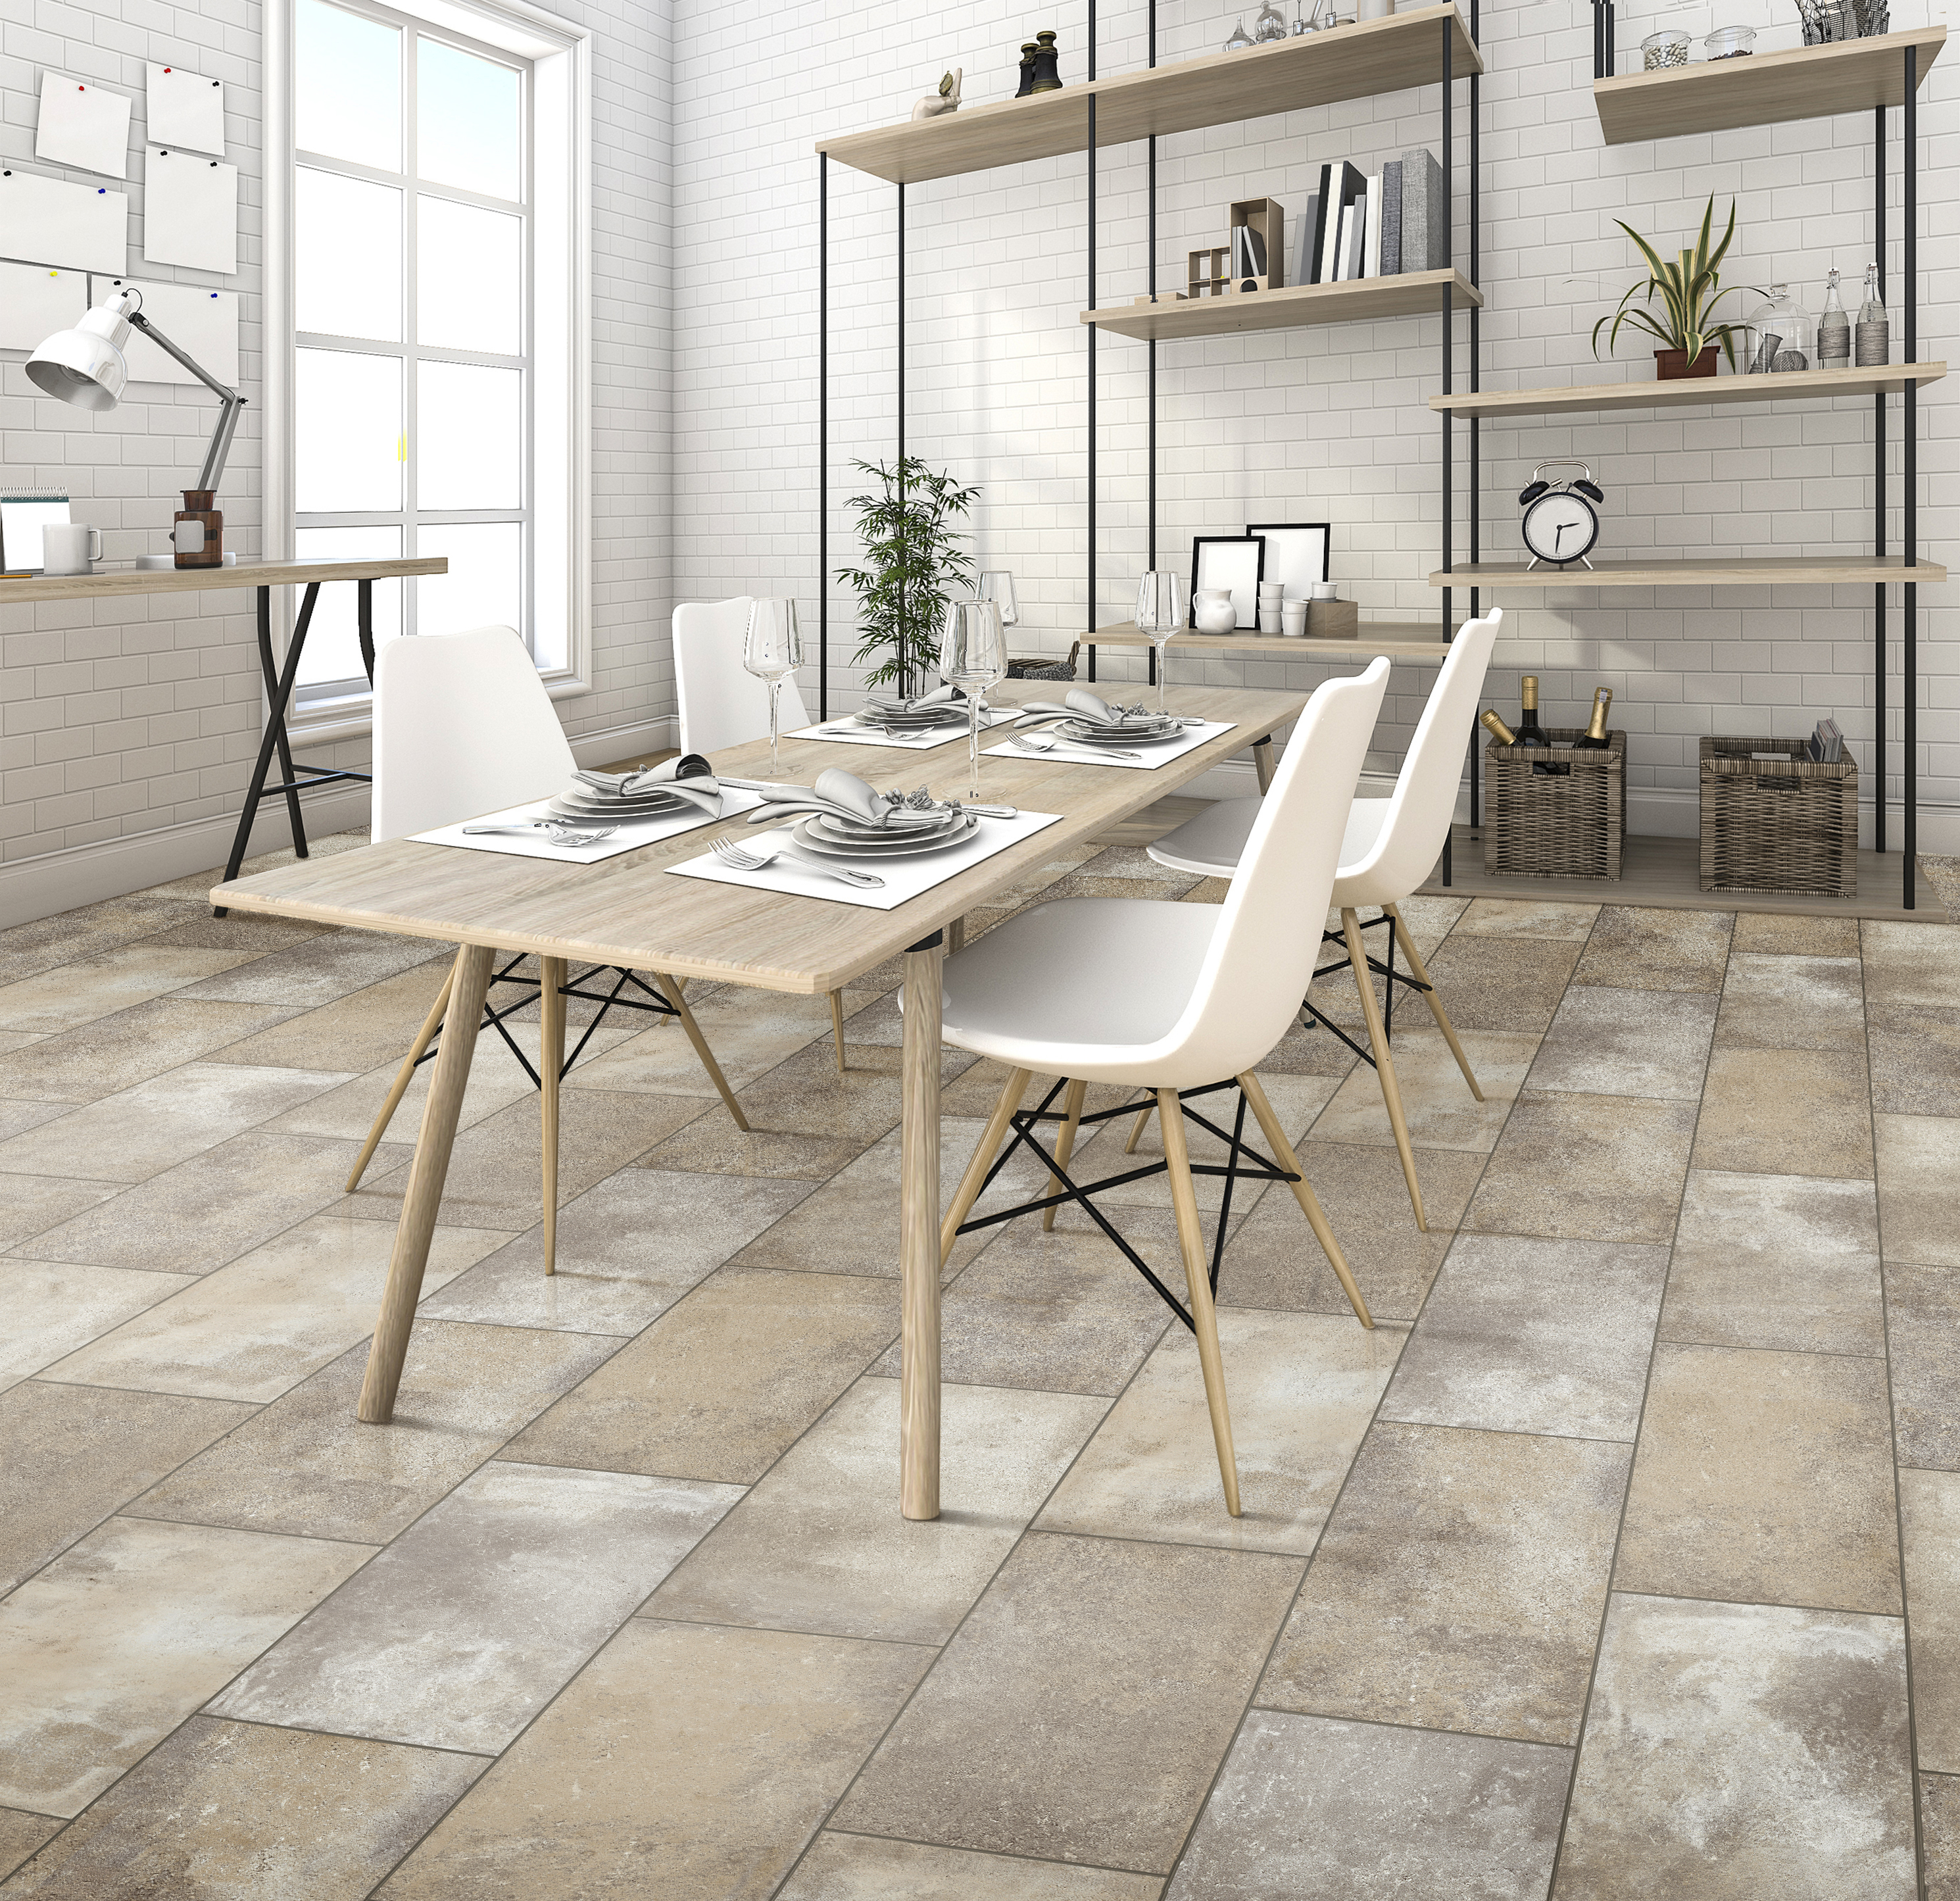 Tile Floors - Tile Floor Installation | 50 Floor